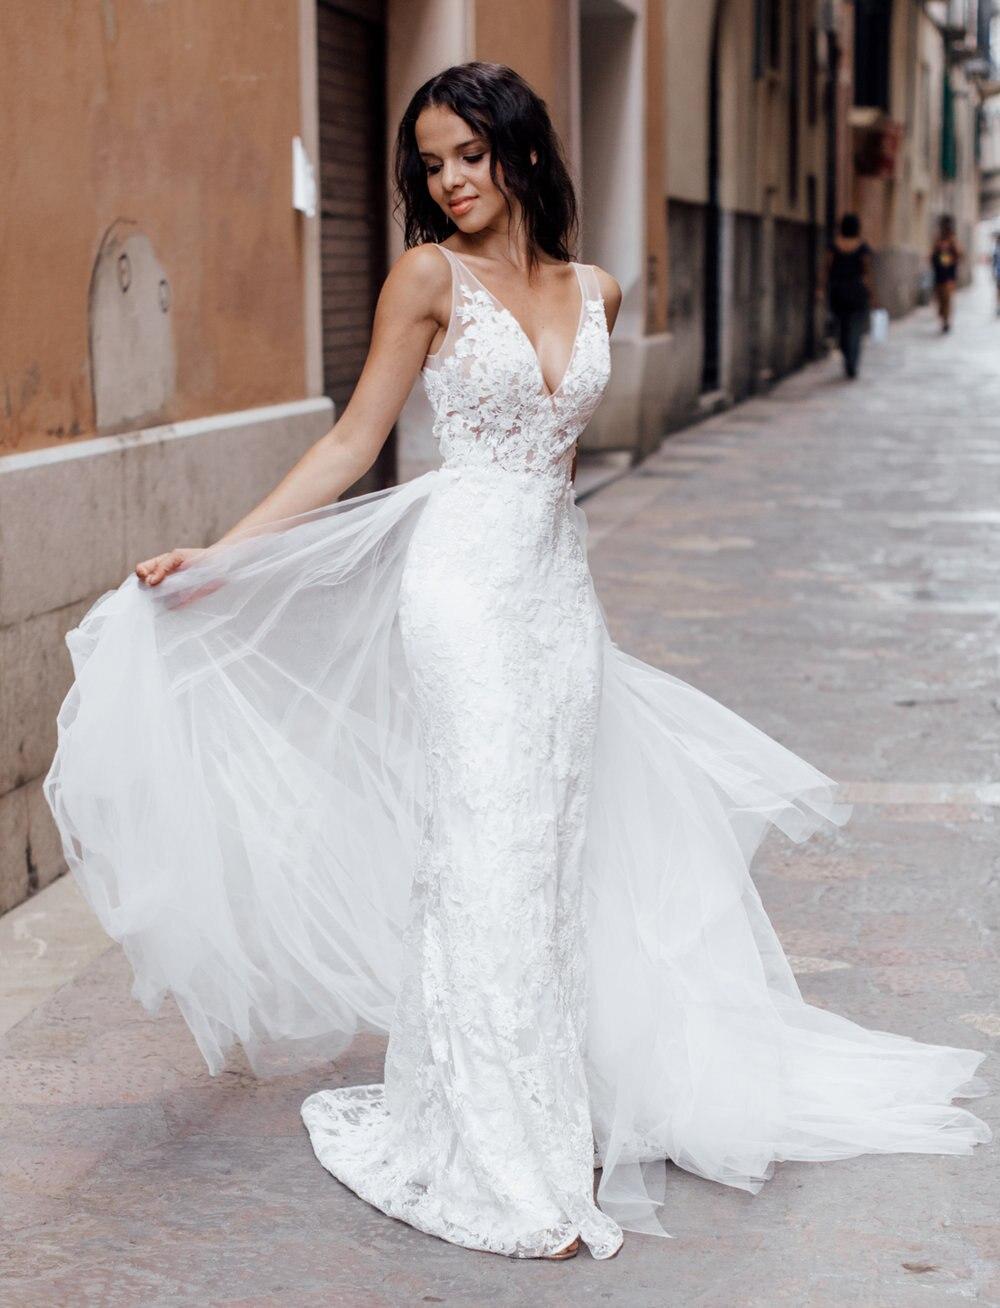 Elegant Mermaid Ivory White Wedding Dress Lace V Neck Robe De Mariee Sofuge Dubai Arabic Abiti Da Sposa Detachable Train